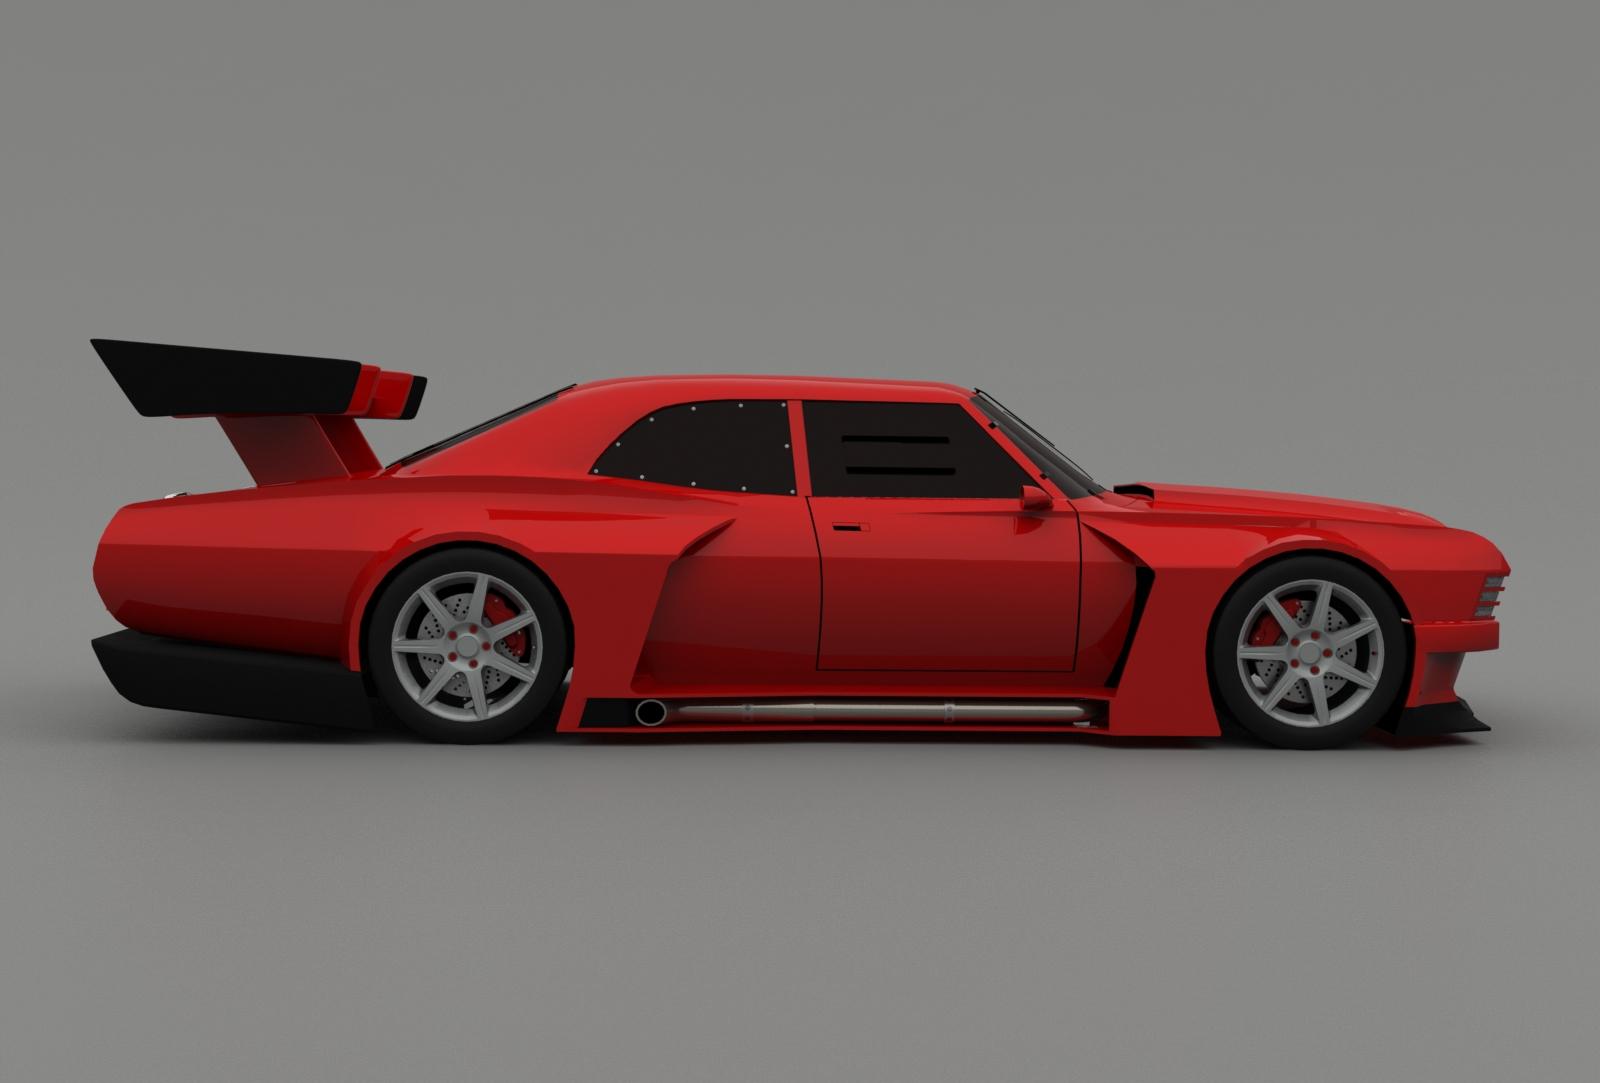 2013-03_The Crew_F.Beudin_Chevrolet Impala-1967-Racing2 Design_07